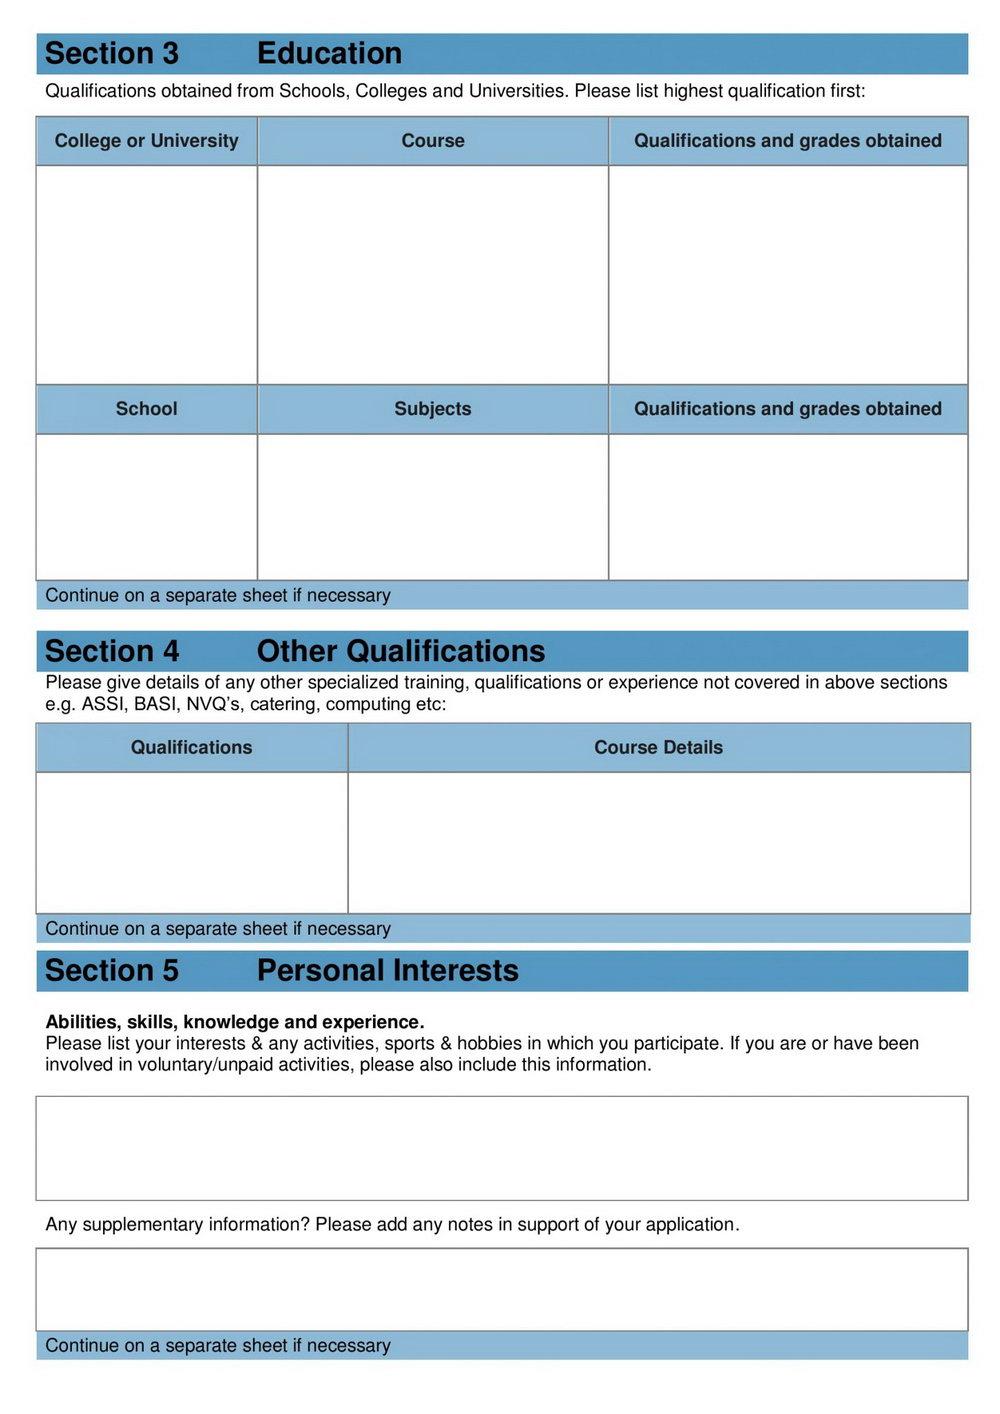 Lowes Job Application Form Pdf